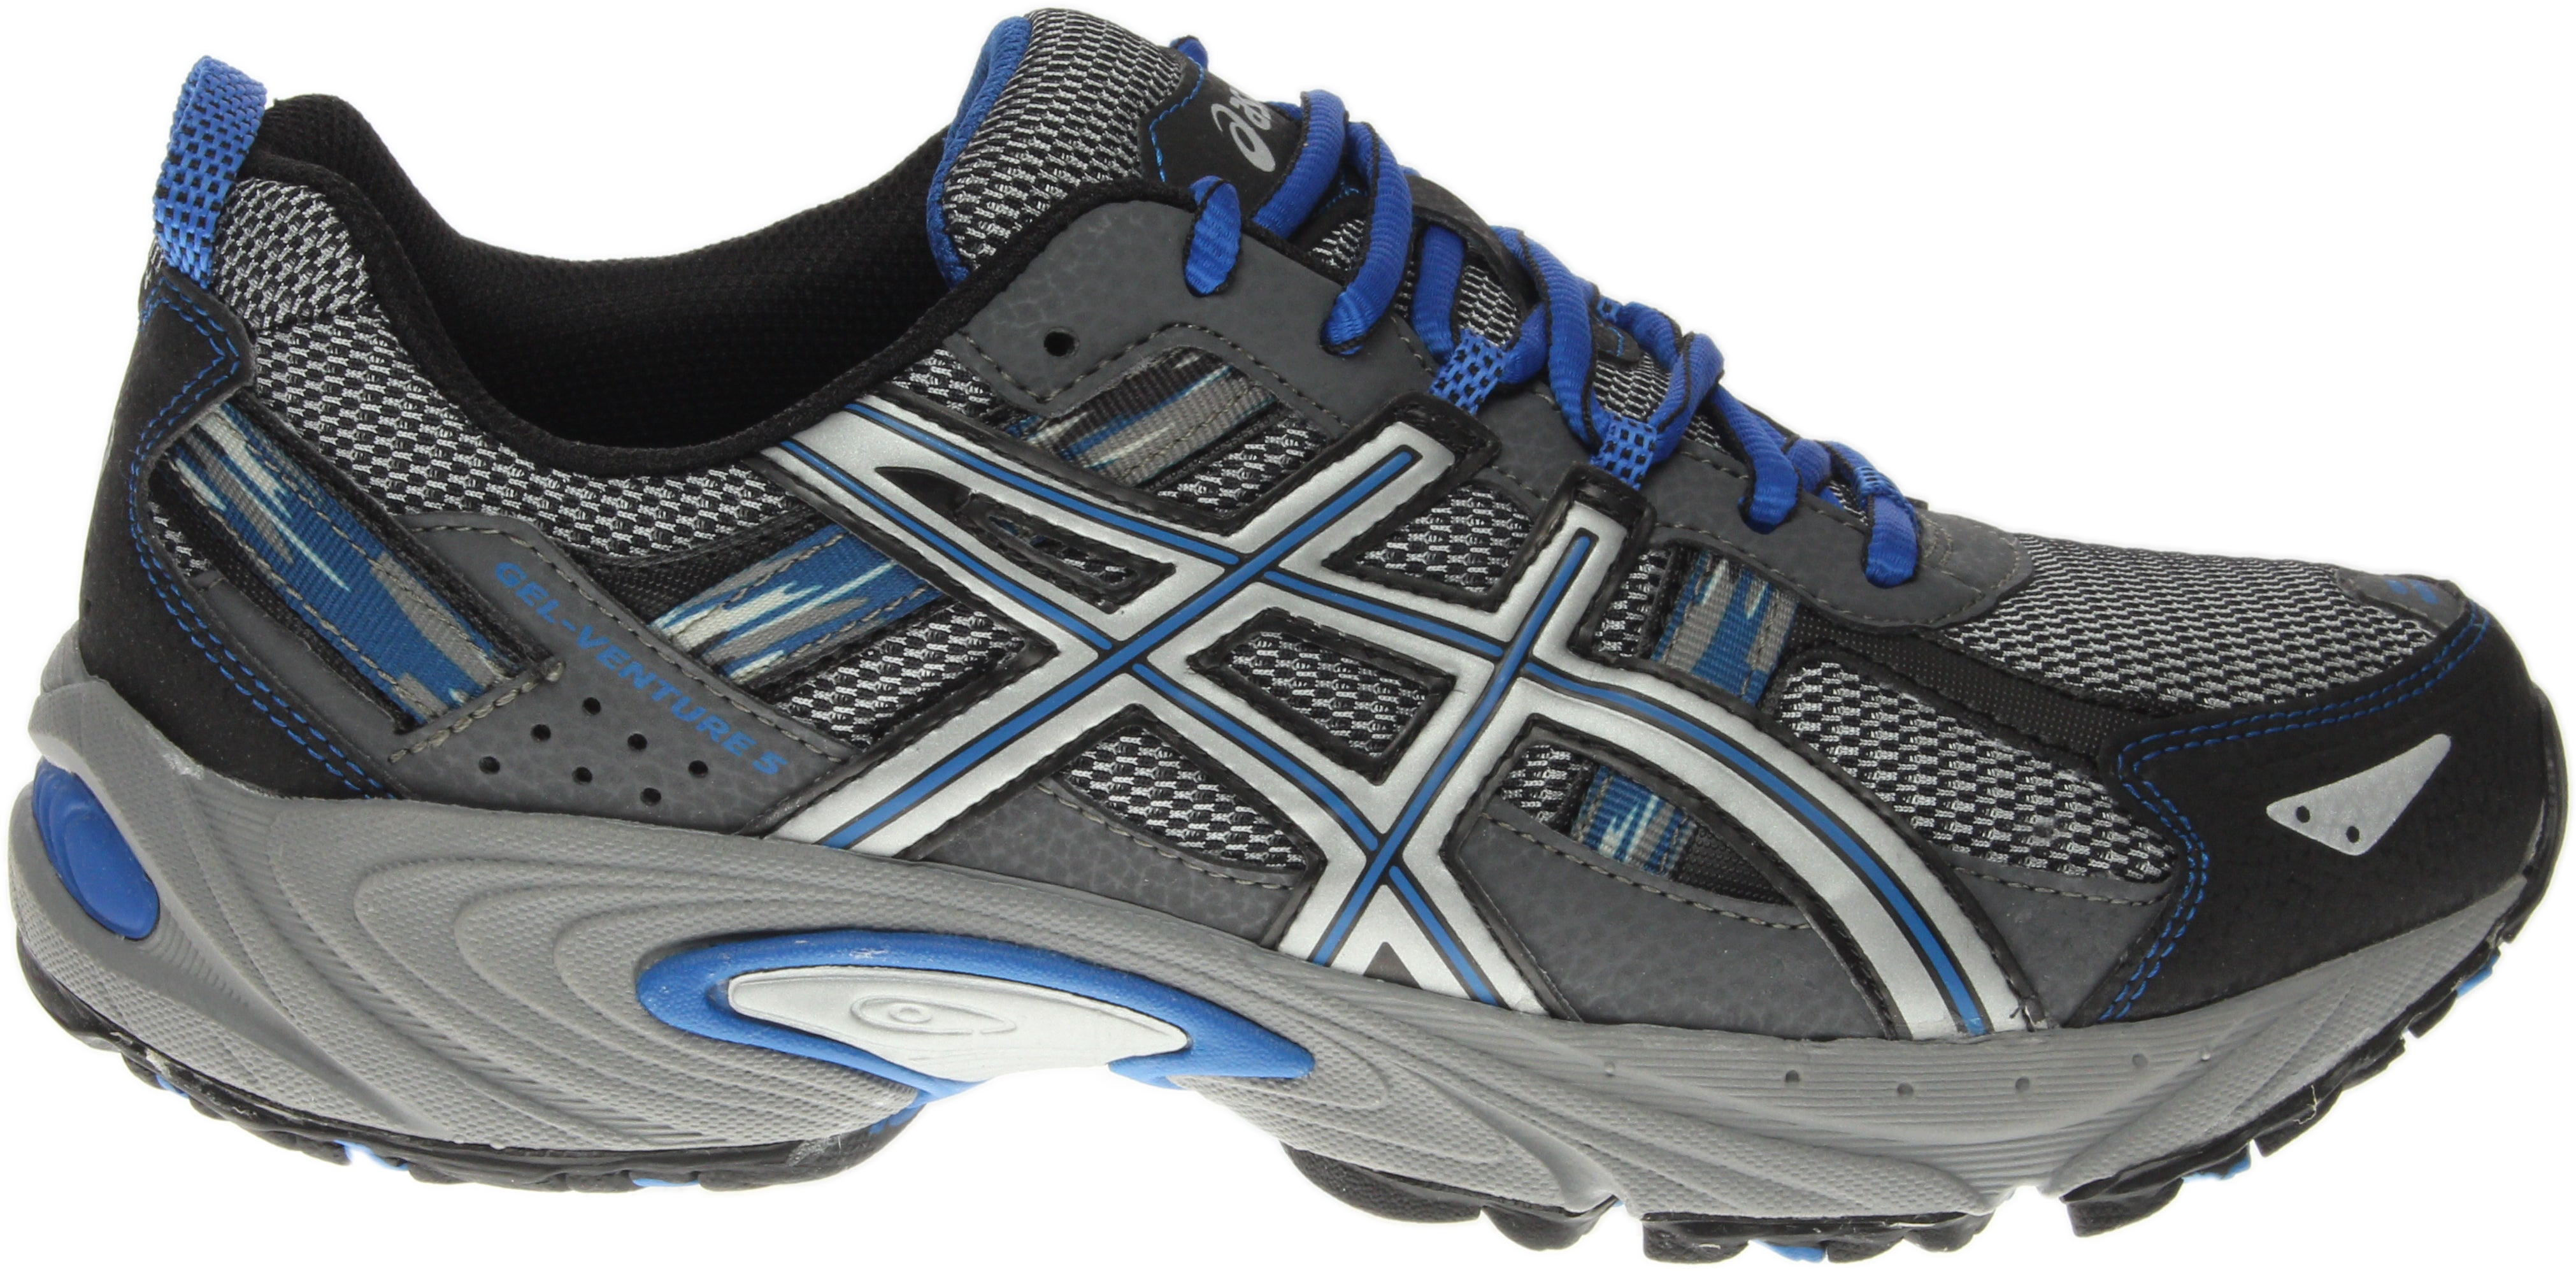 ASICS GEL-Venture 5 Running Shoes - Grey - Mens  a3dd690df6089